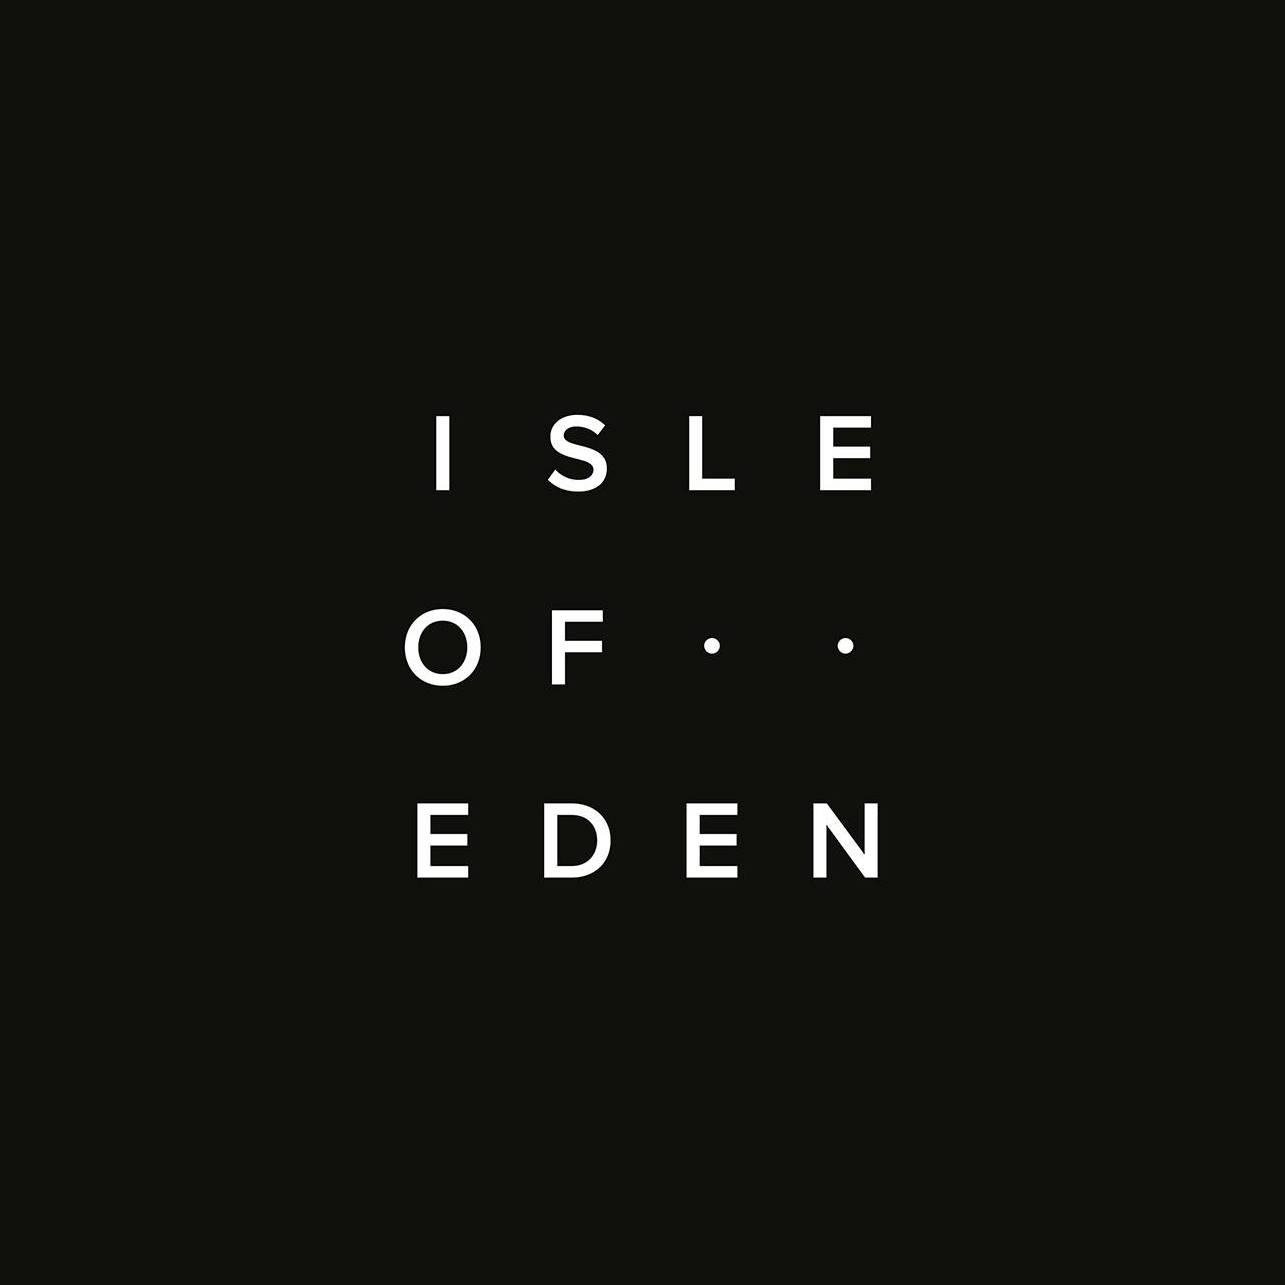 Isle of Eden